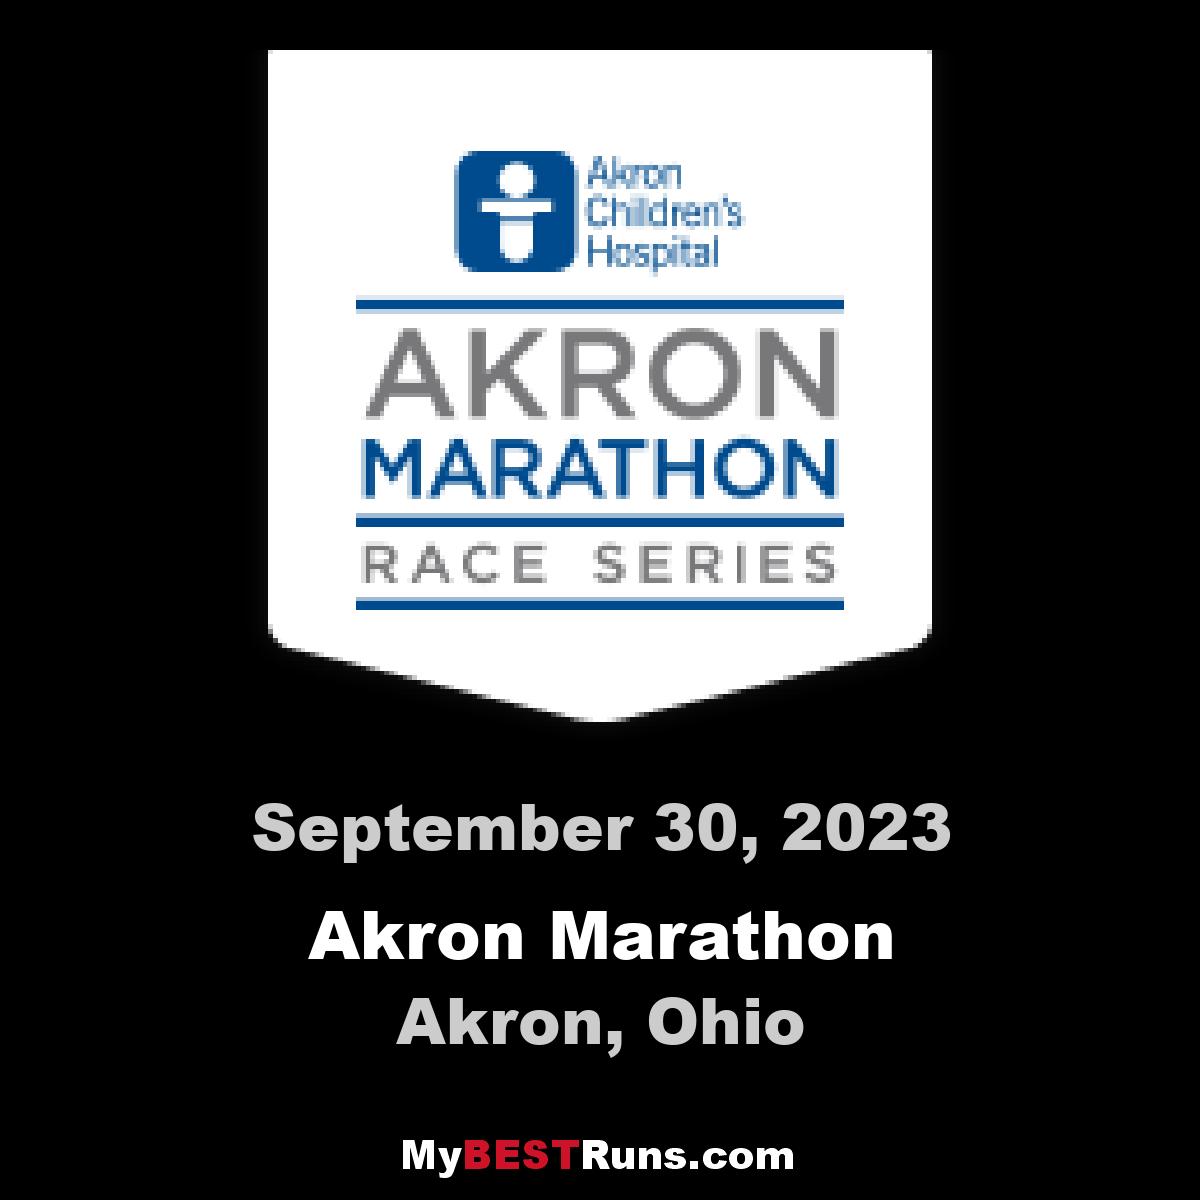 Akron Marathon Race Series